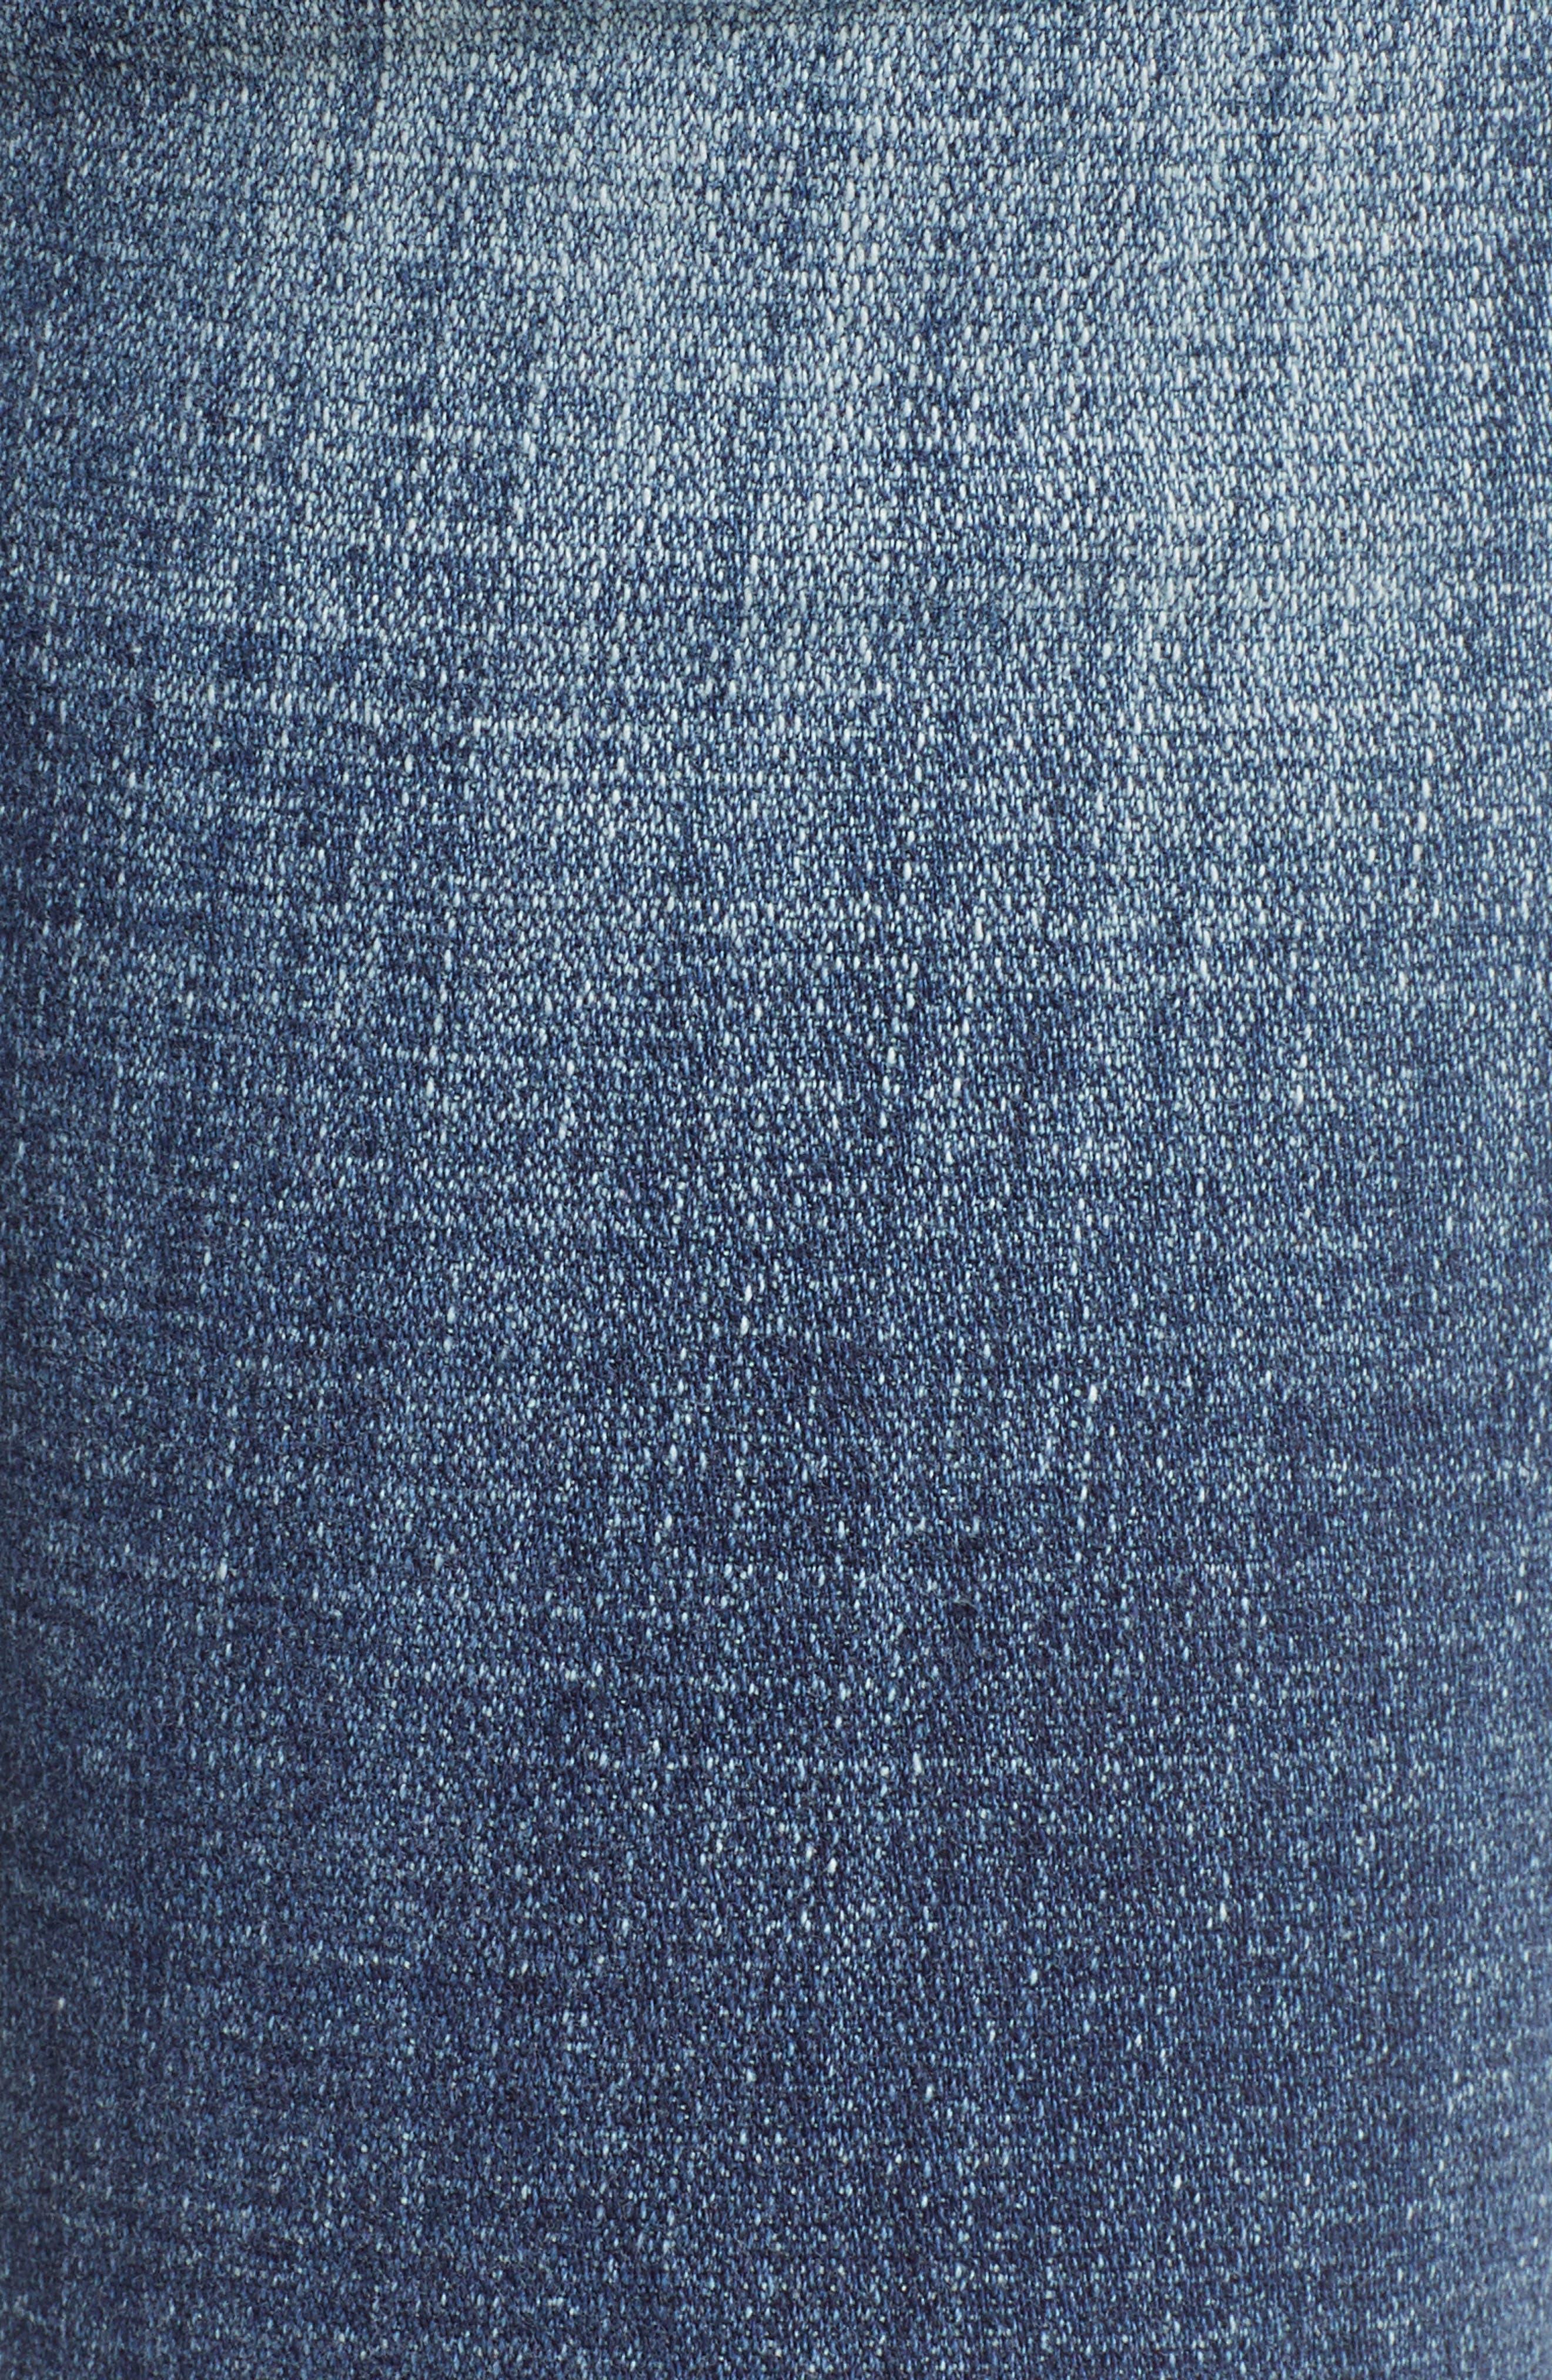 Amy Distressed Crop Jeans,                             Alternate thumbnail 6, color,                             Soar